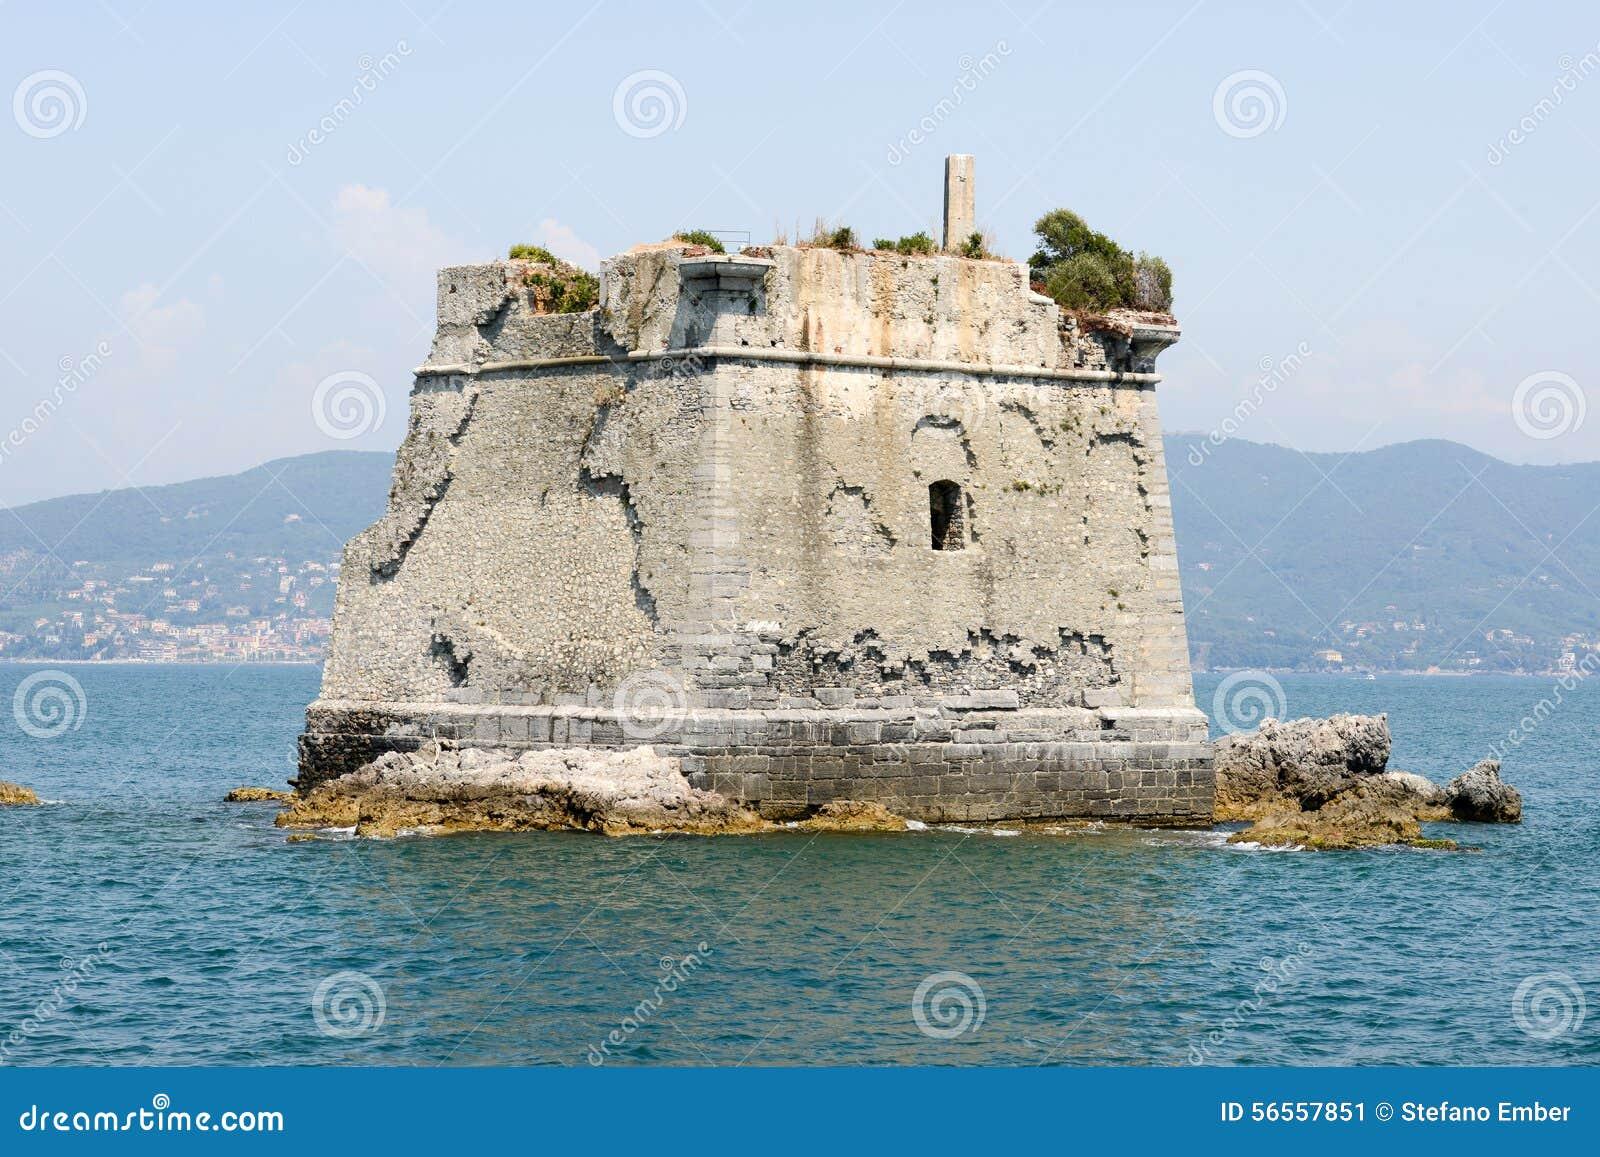 Download Σχολικός πύργος στο νησί Palmaria κοντά σε Portovenere Εκδοτική Εικόνες - εικόνα από σχολείο, ιταλία: 56557851